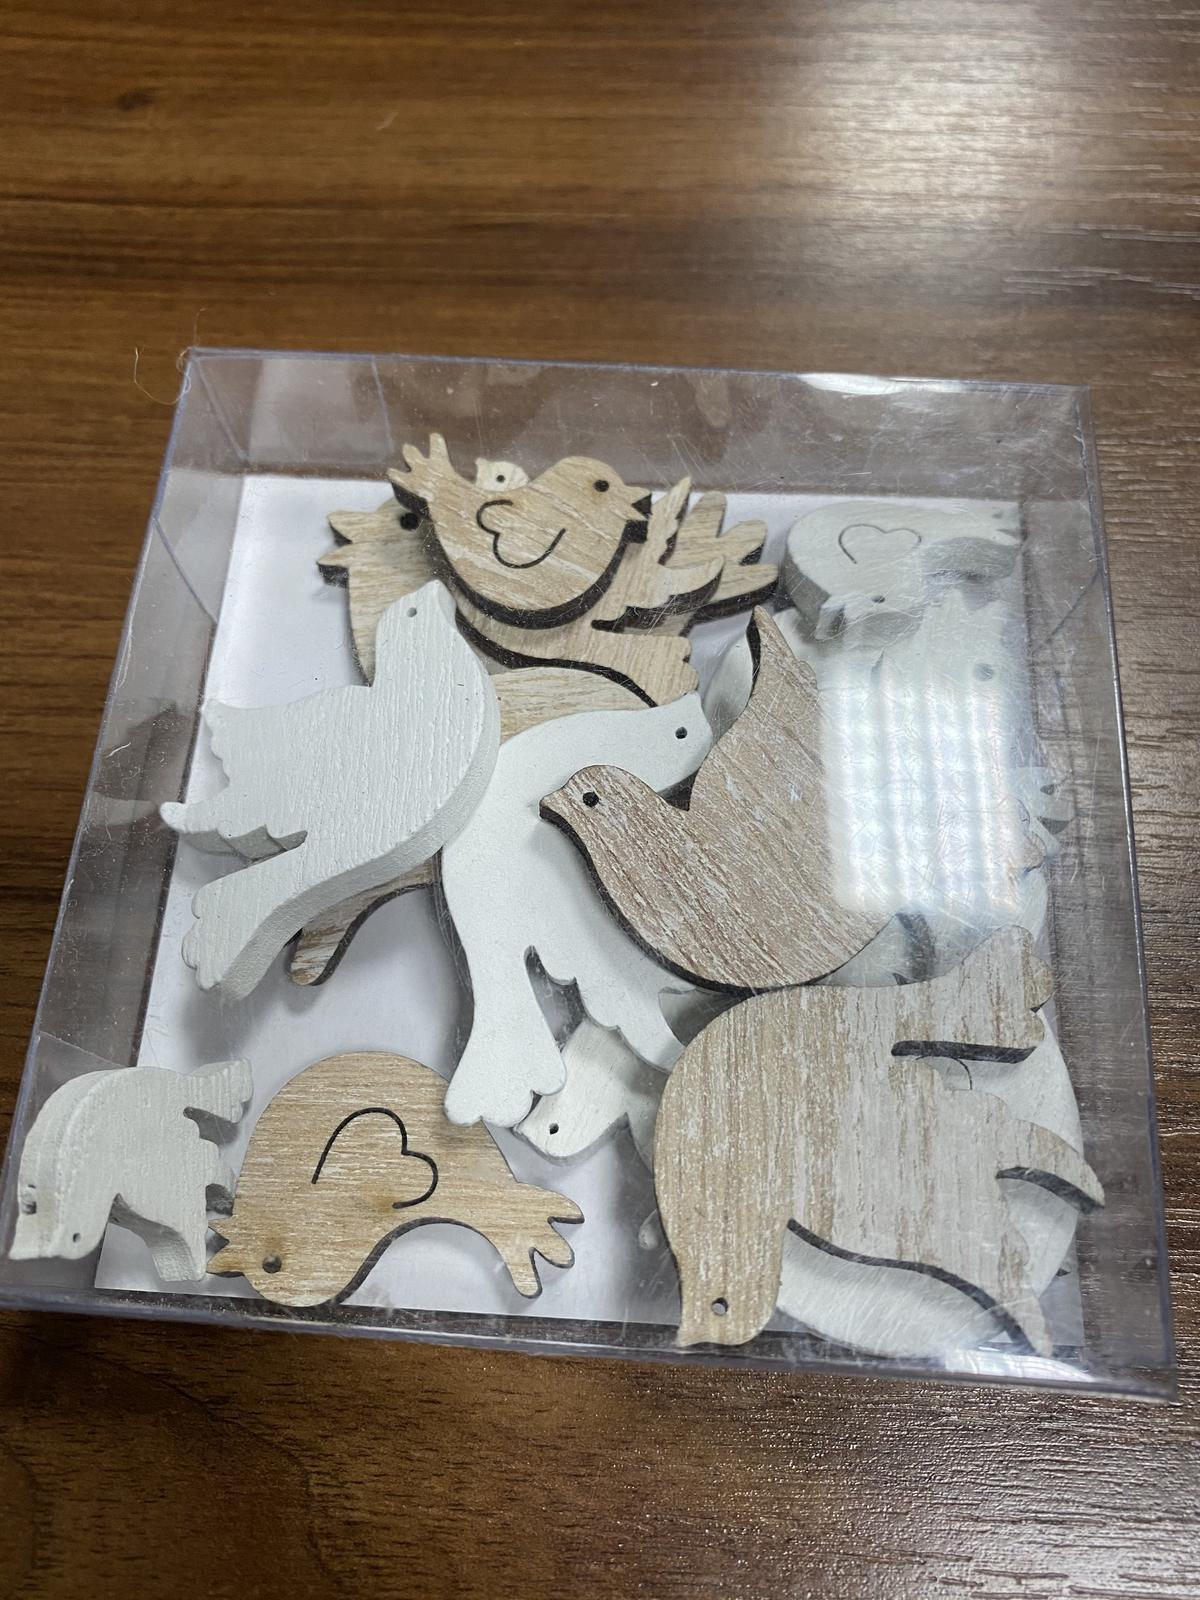 Drevené holubice  - Obrázok č. 1